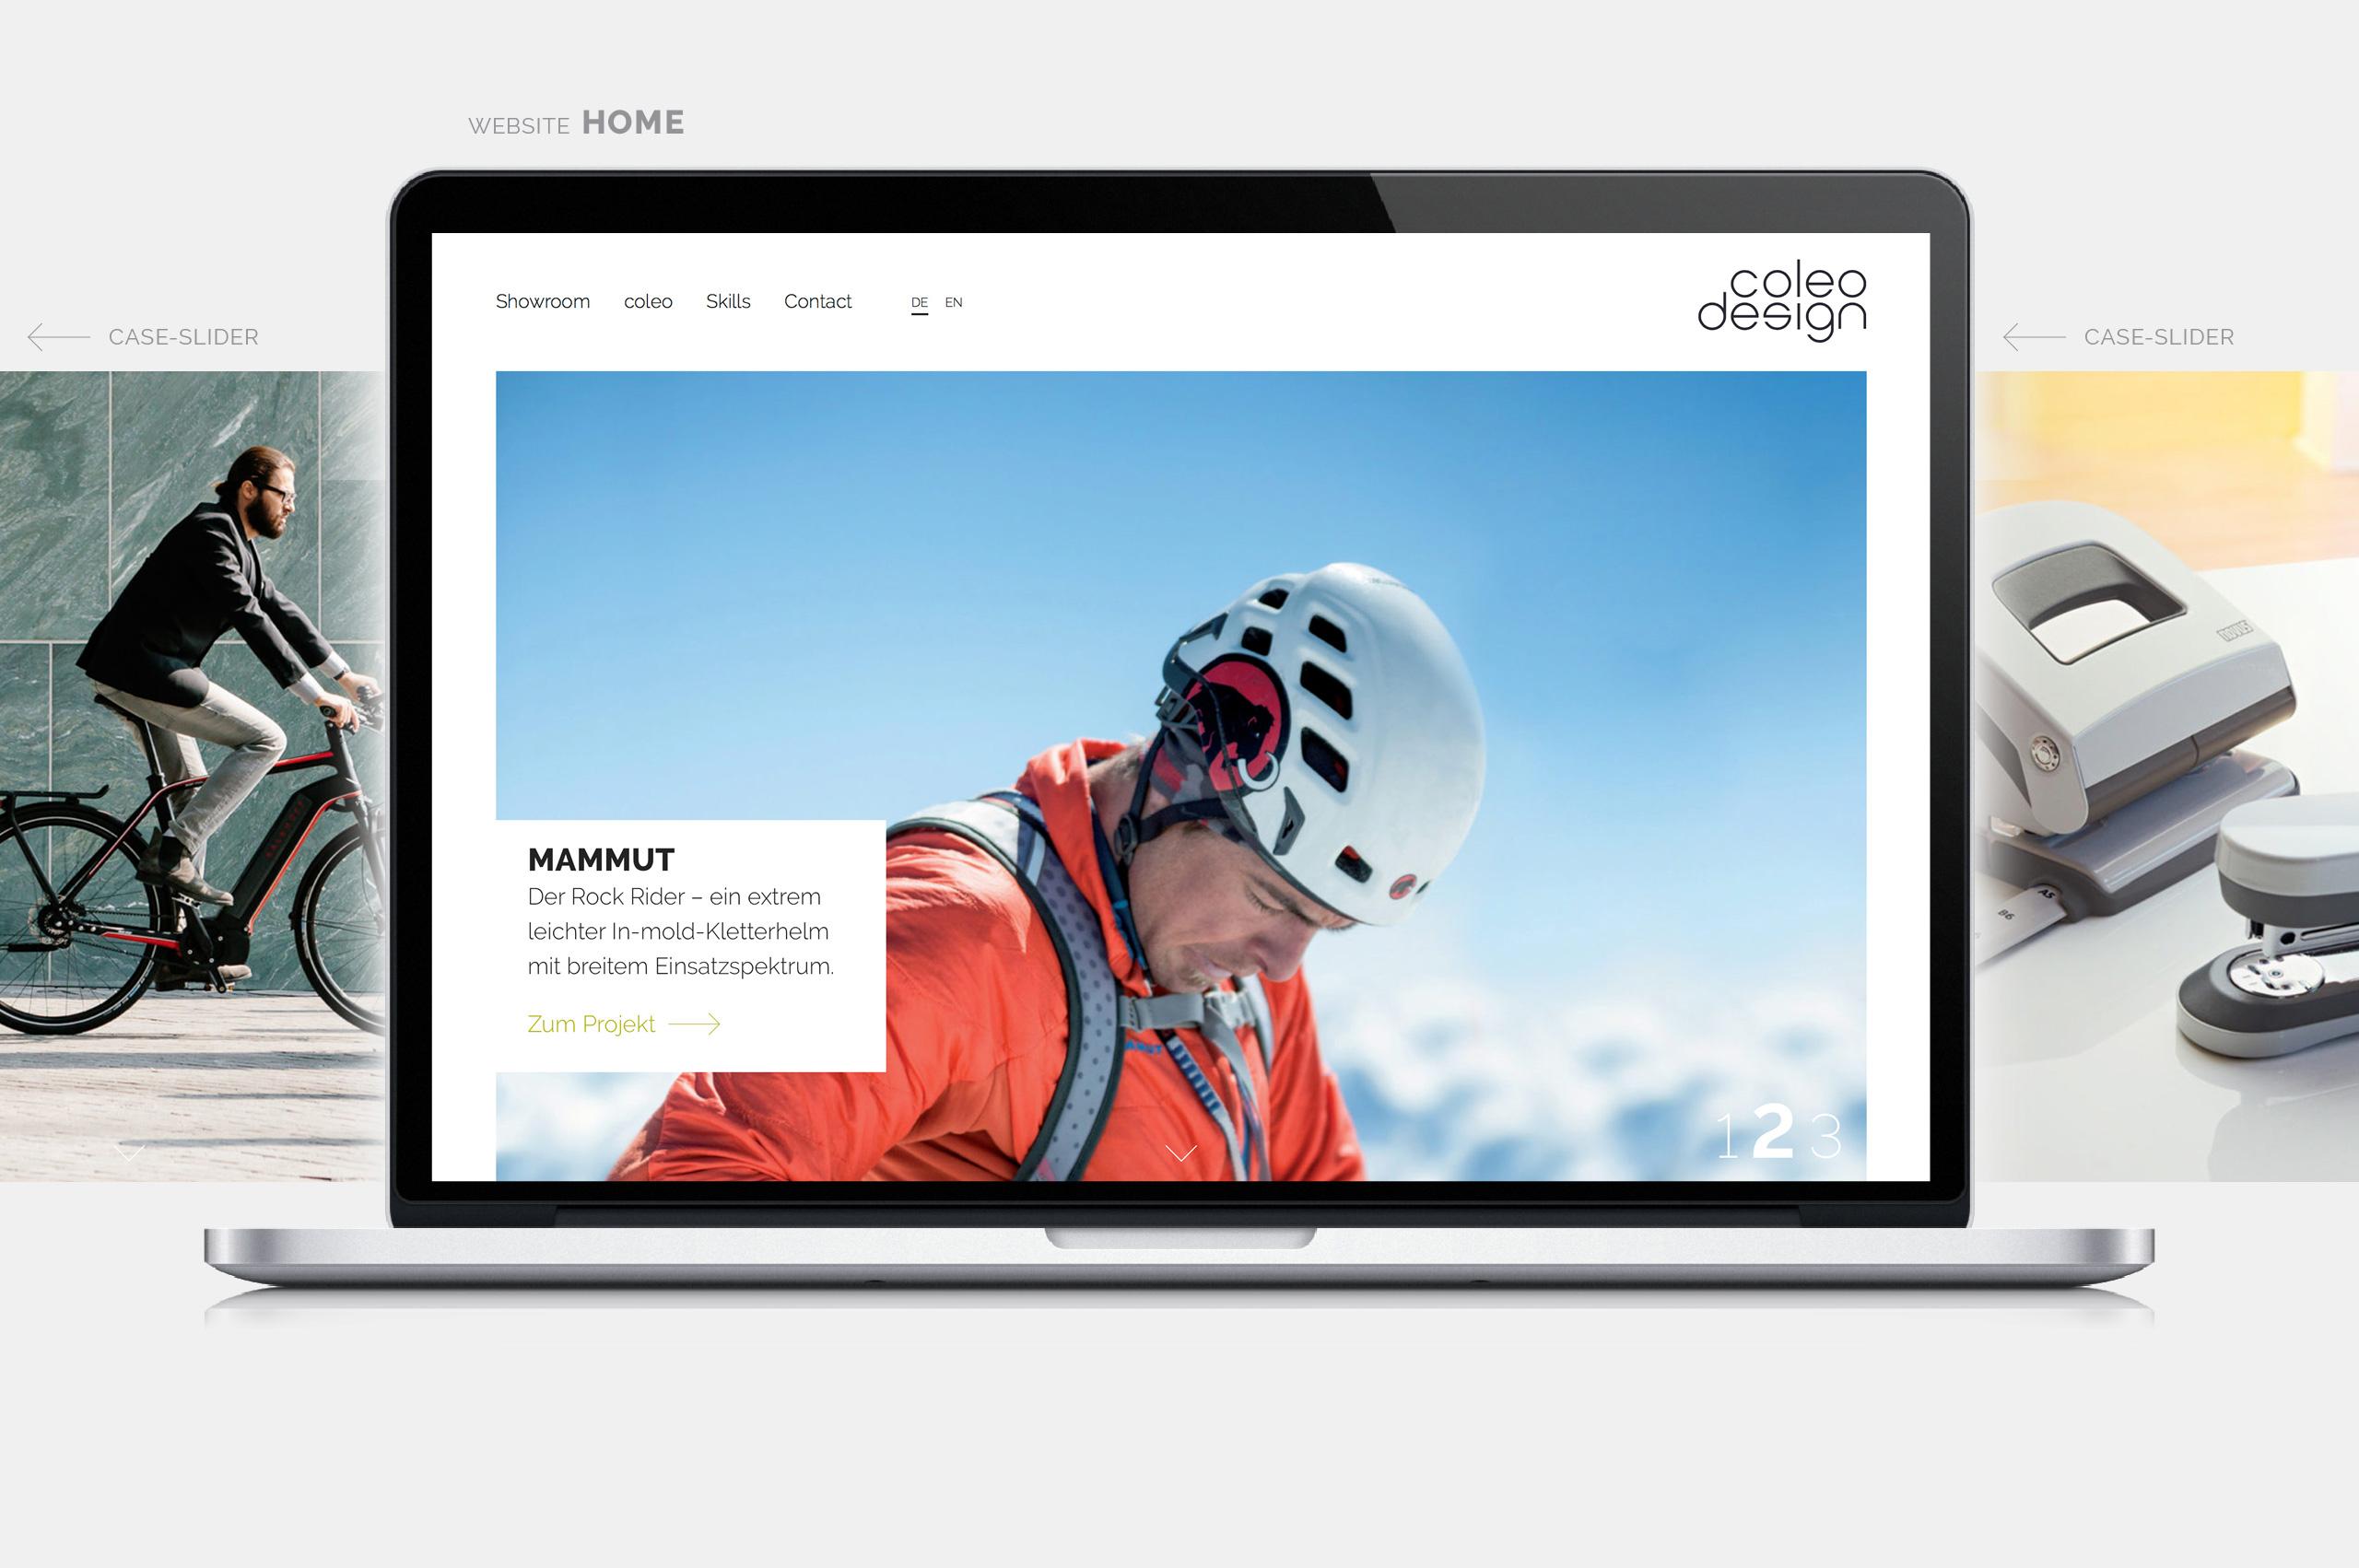 coleo design 2